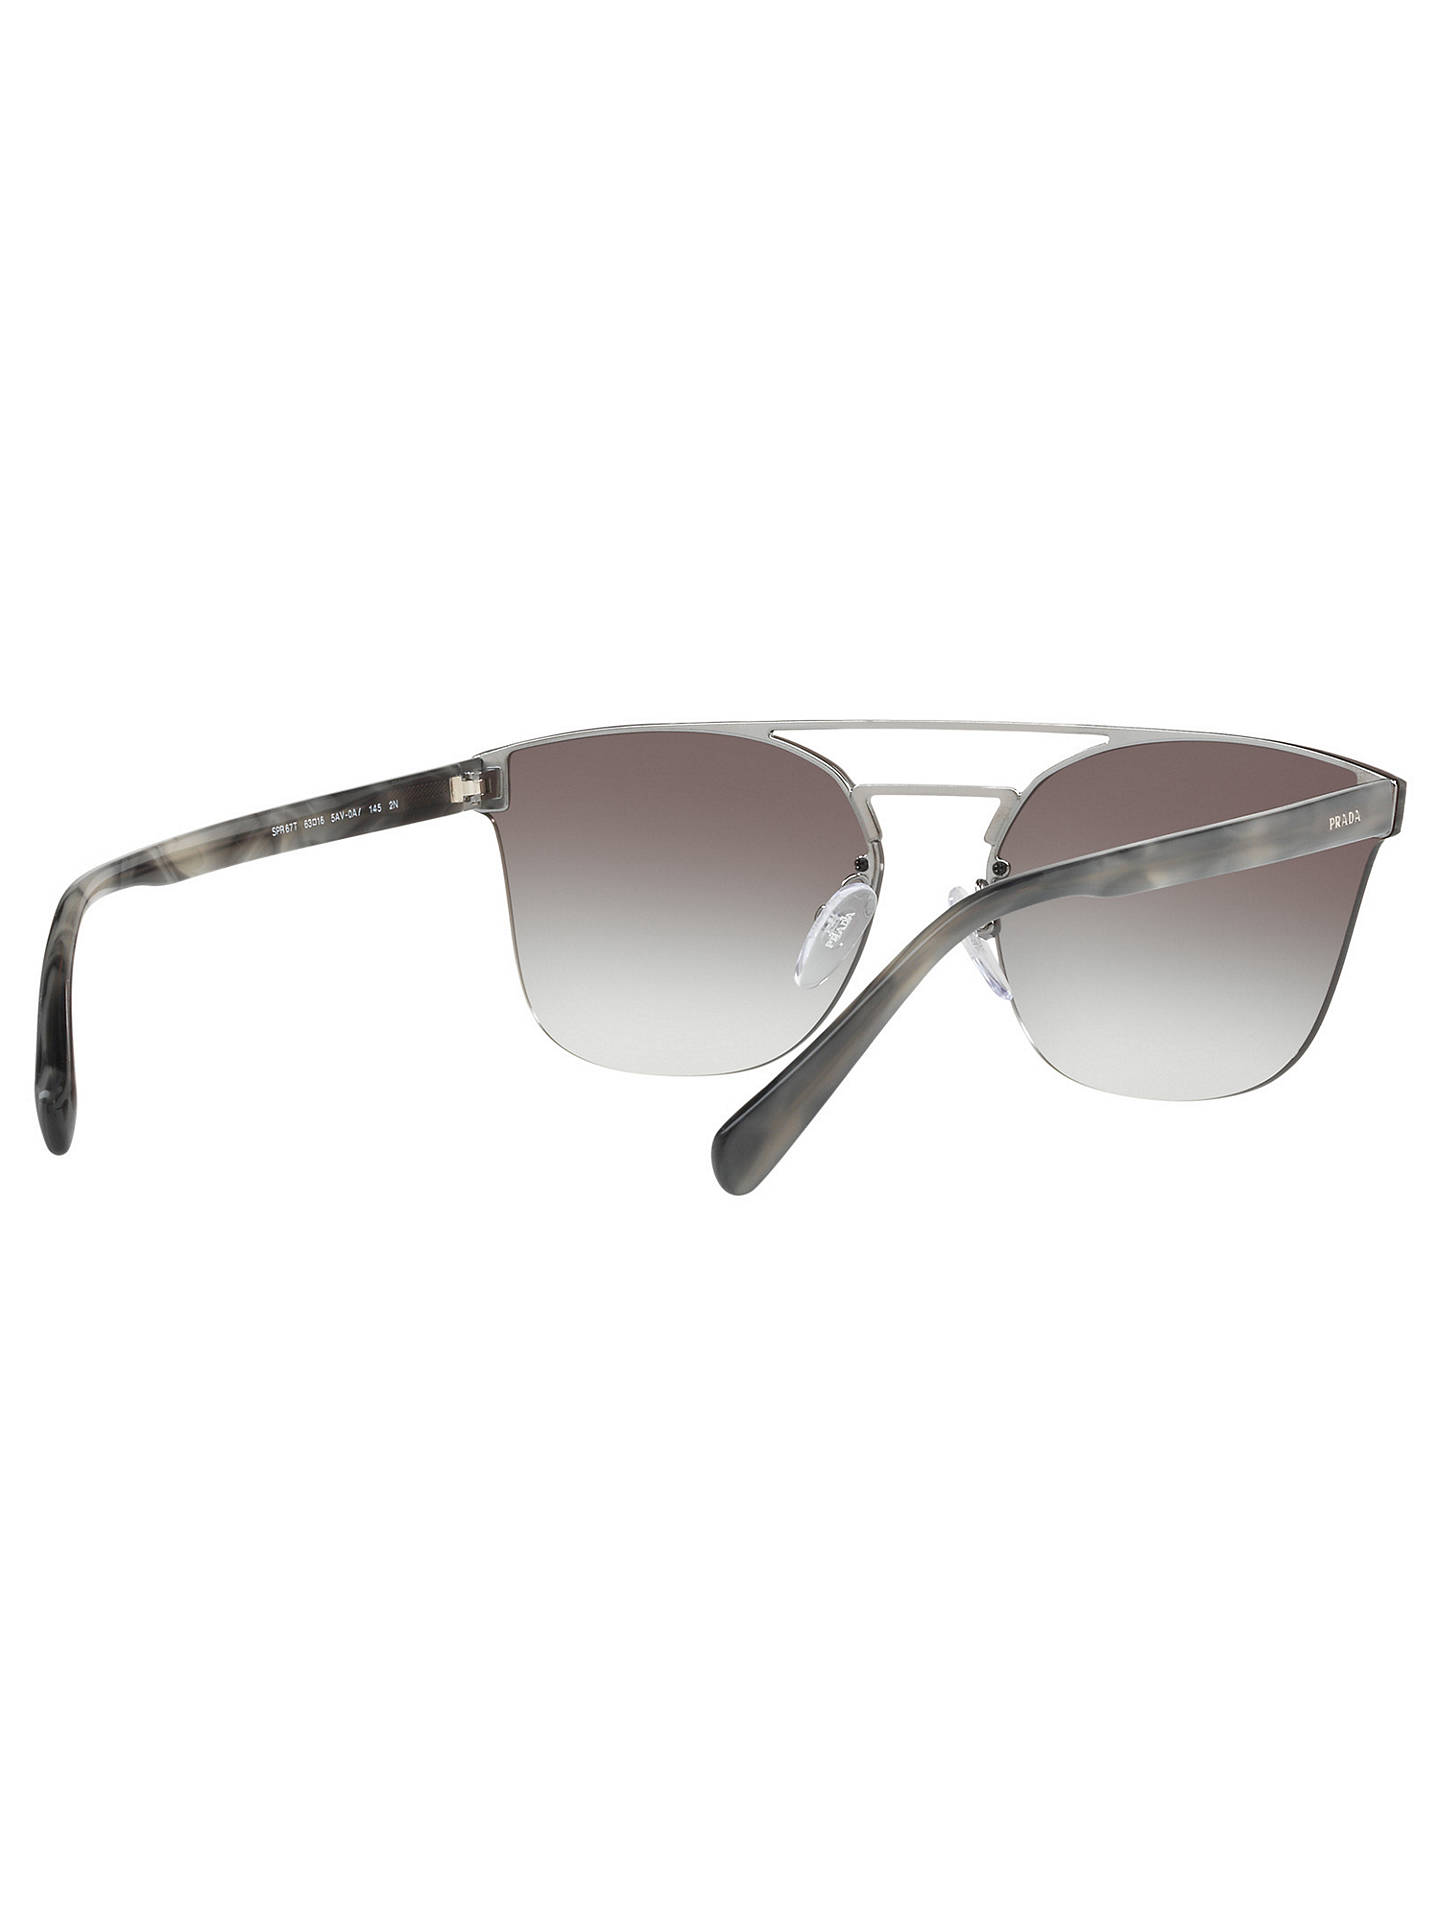 7b2007da2e6b cheapest buyprada pr 67ts womens square sunglasses silver grey gradient  online at johnlewis. 011cd 17208